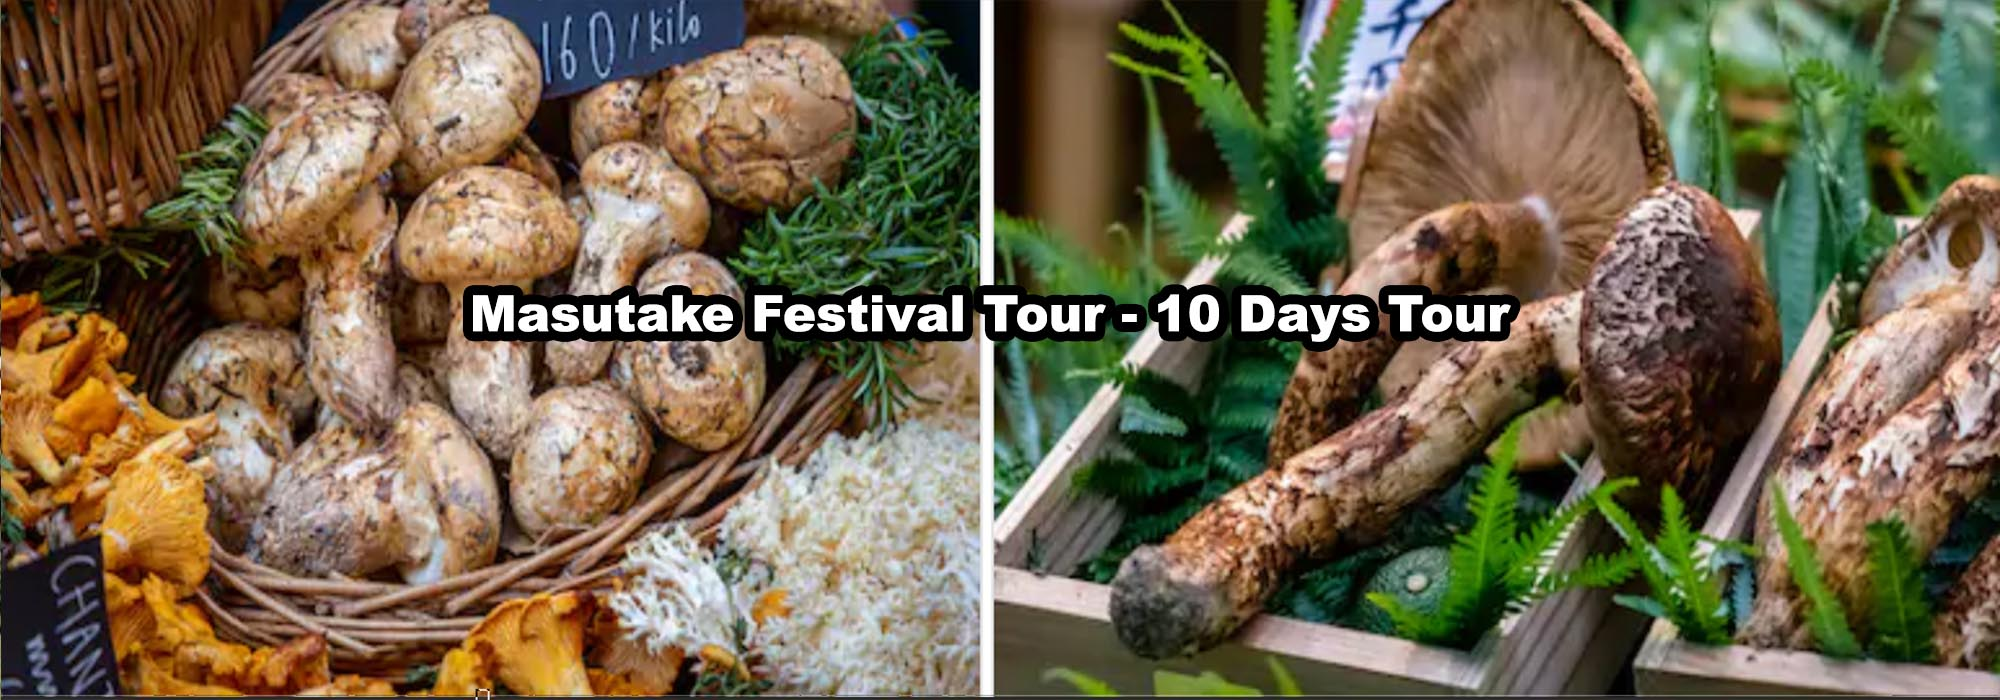 Masutake Festival tour